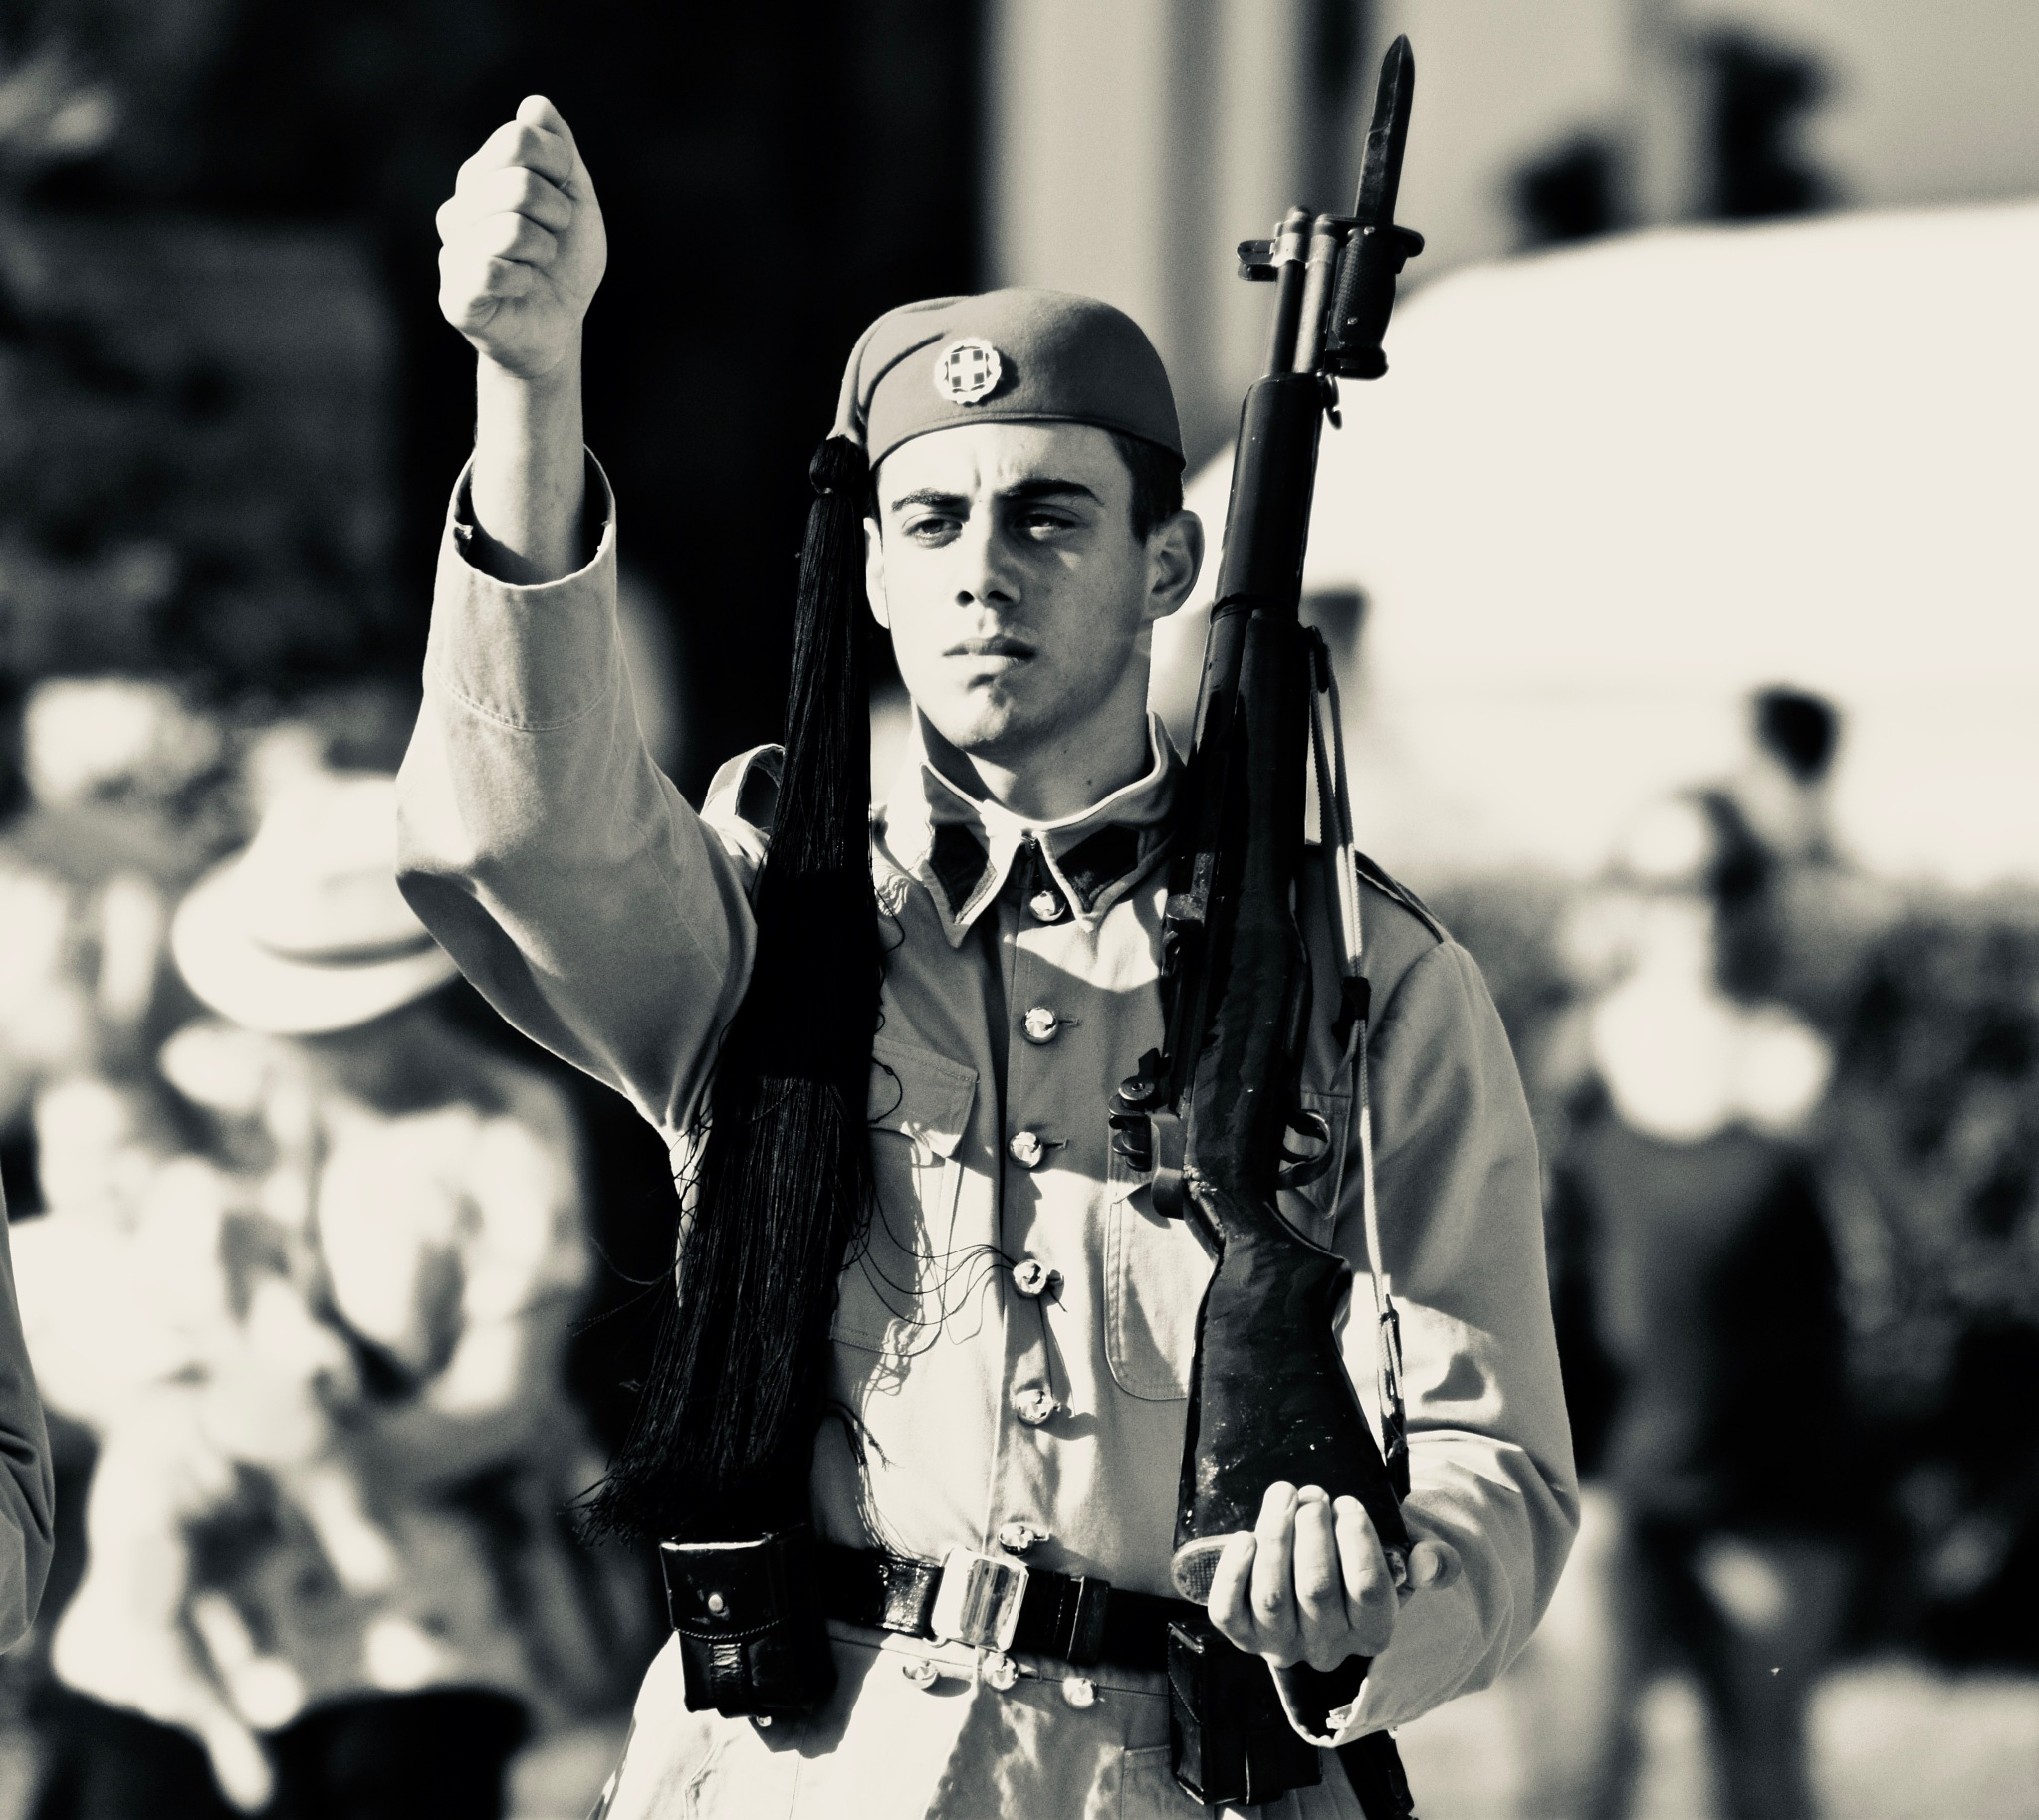 GREEK SOLDIER by Aca Markovic